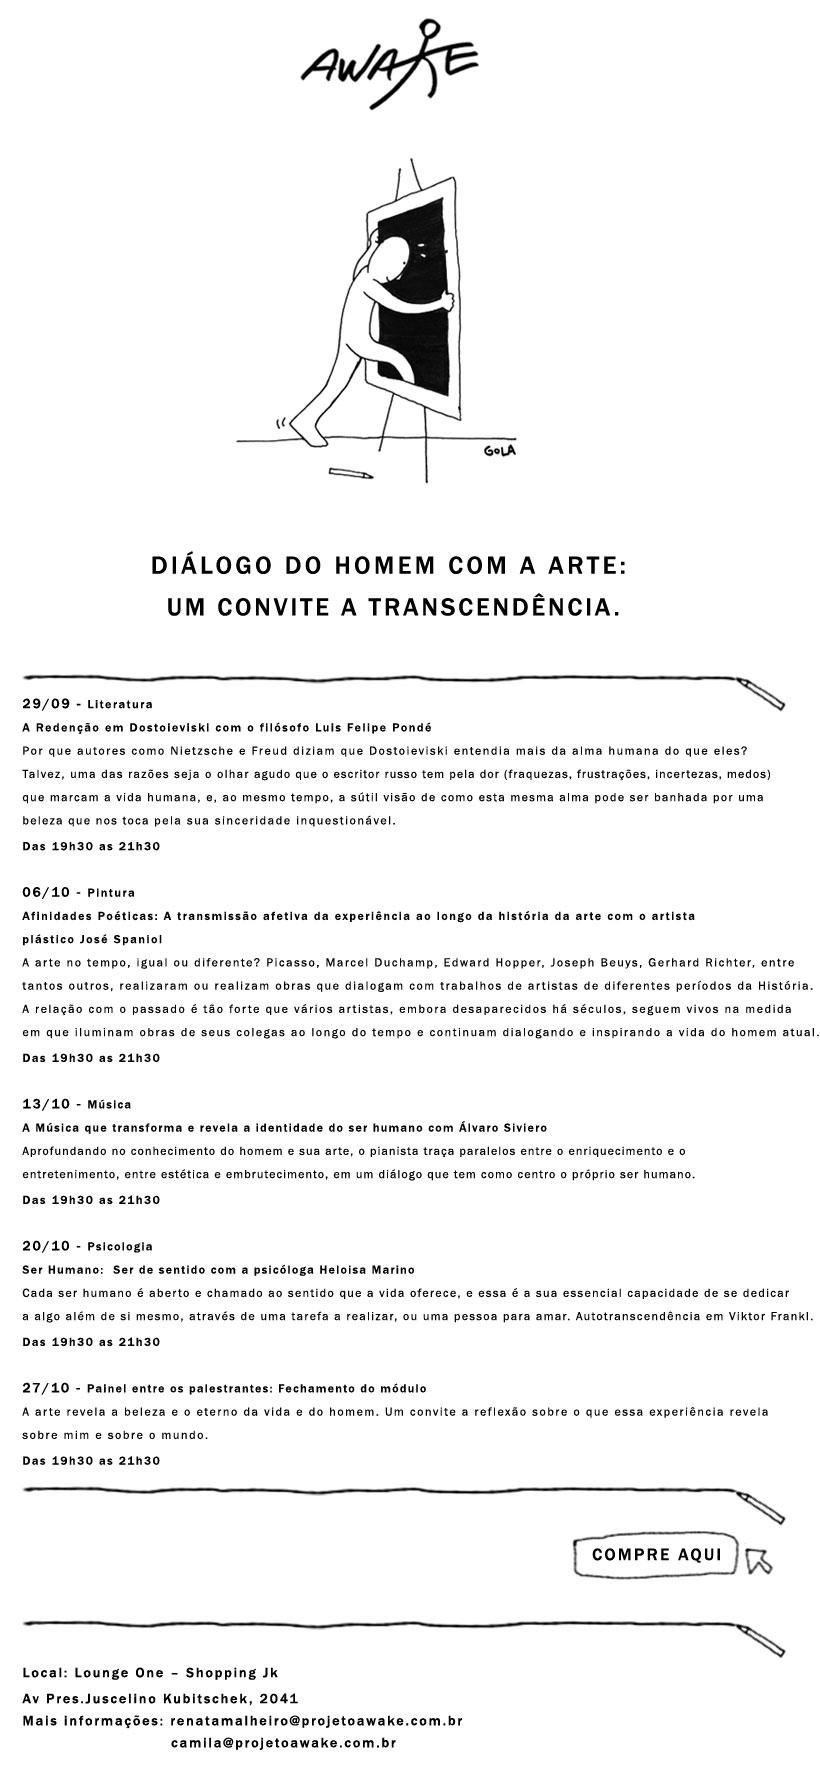 awake_encontroarte03e (1).jpg